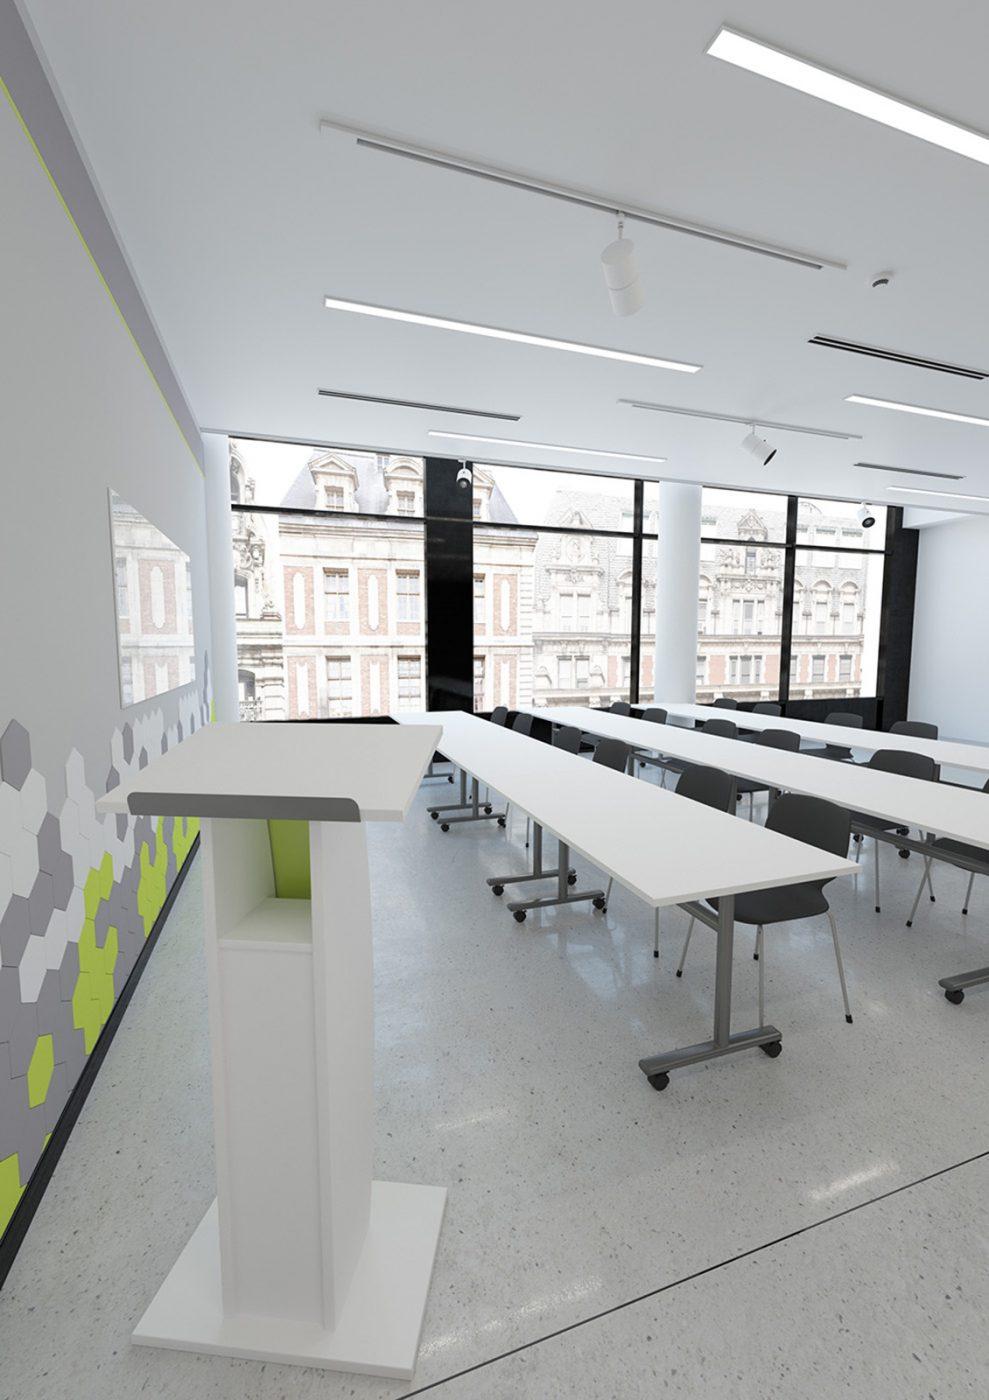 lectern, university furniture, classroom furniture